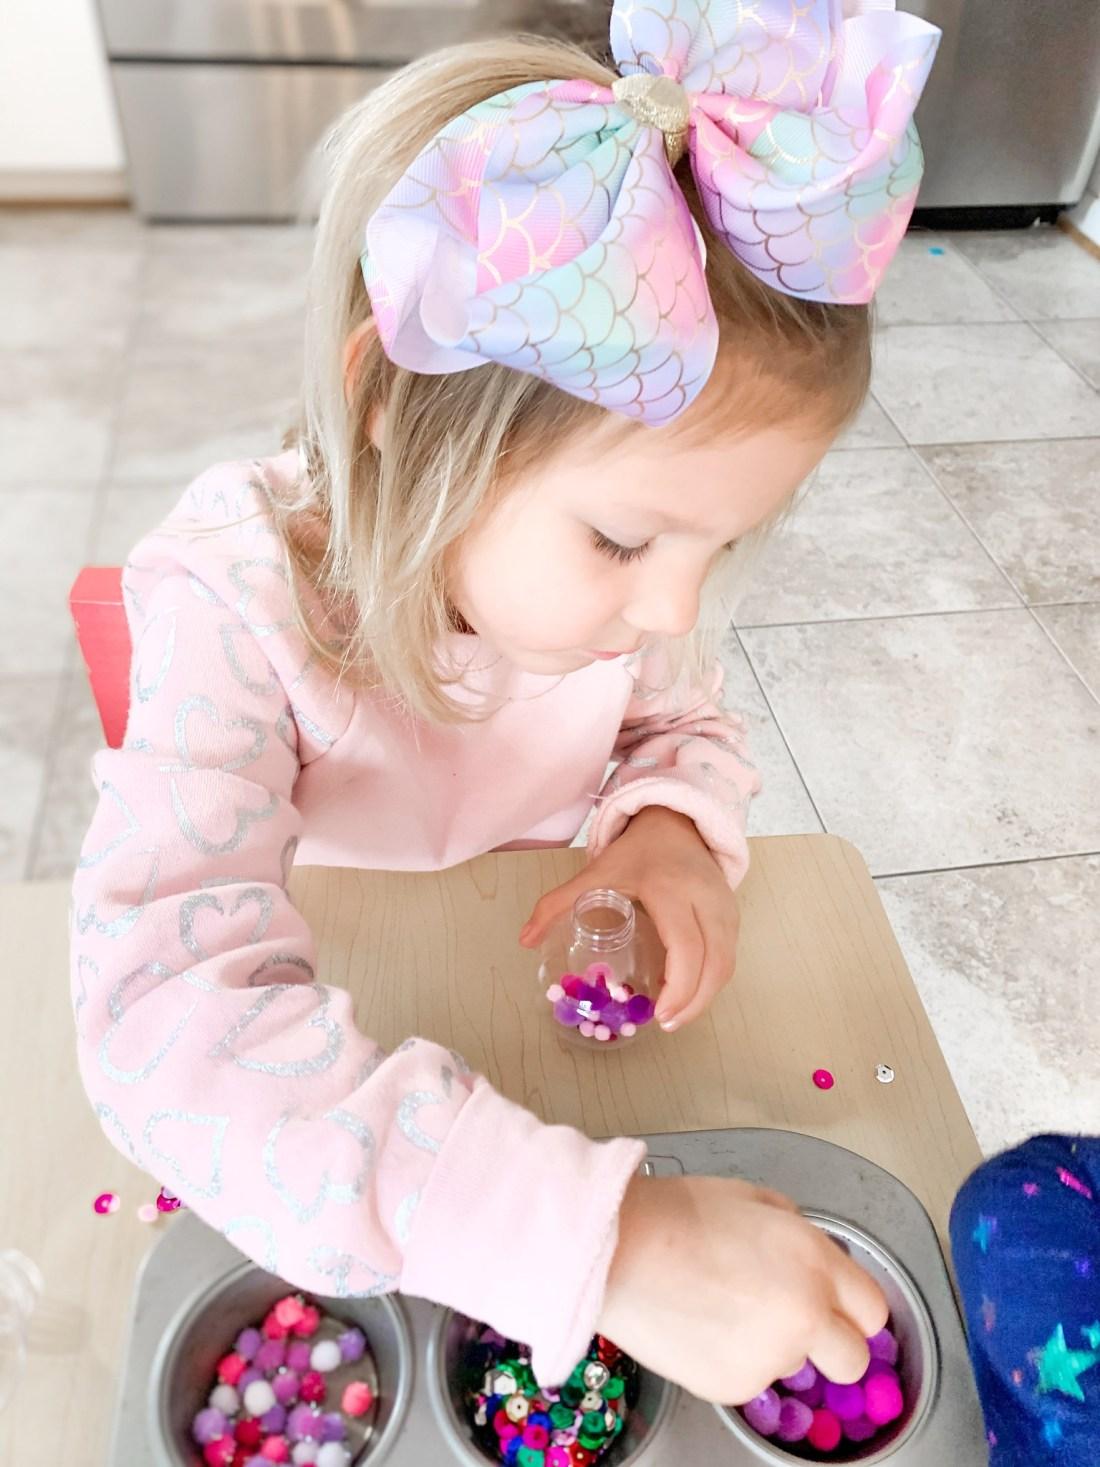 Rosie making ornaments